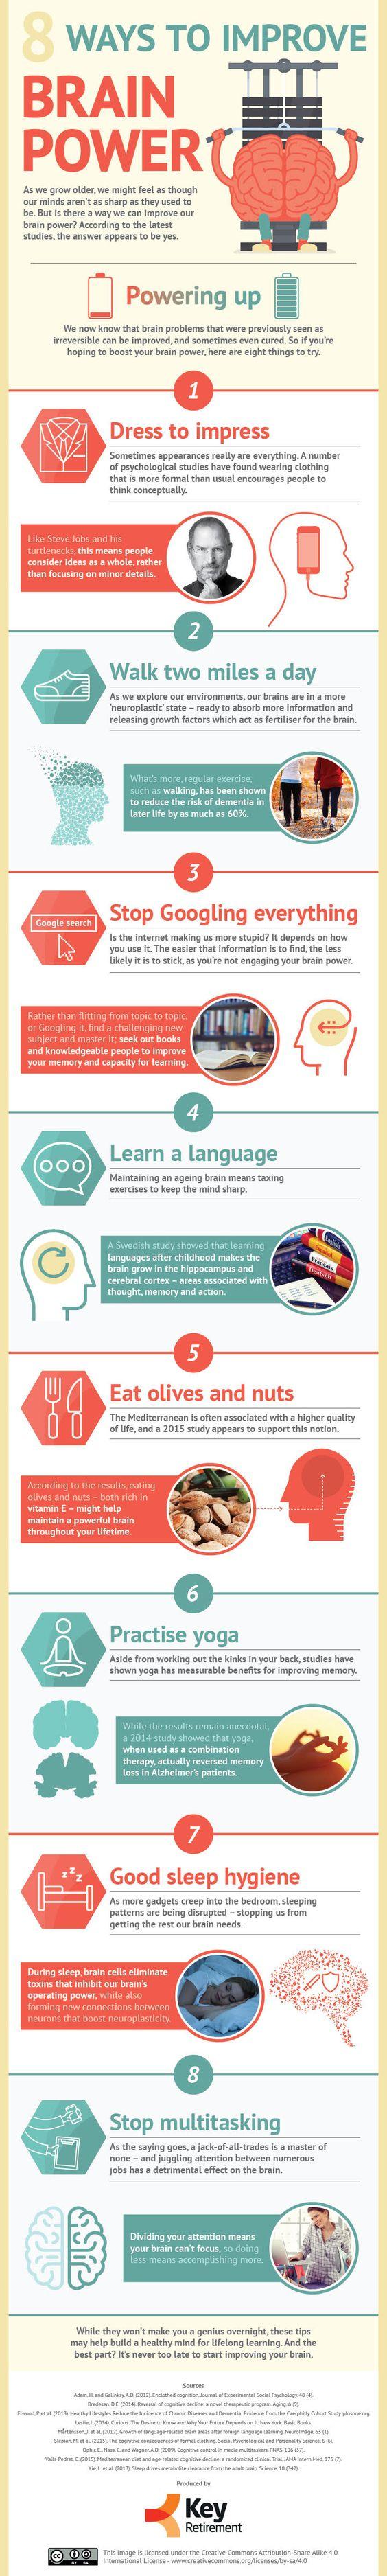 8 Surprising Ways To Improve Brain Power